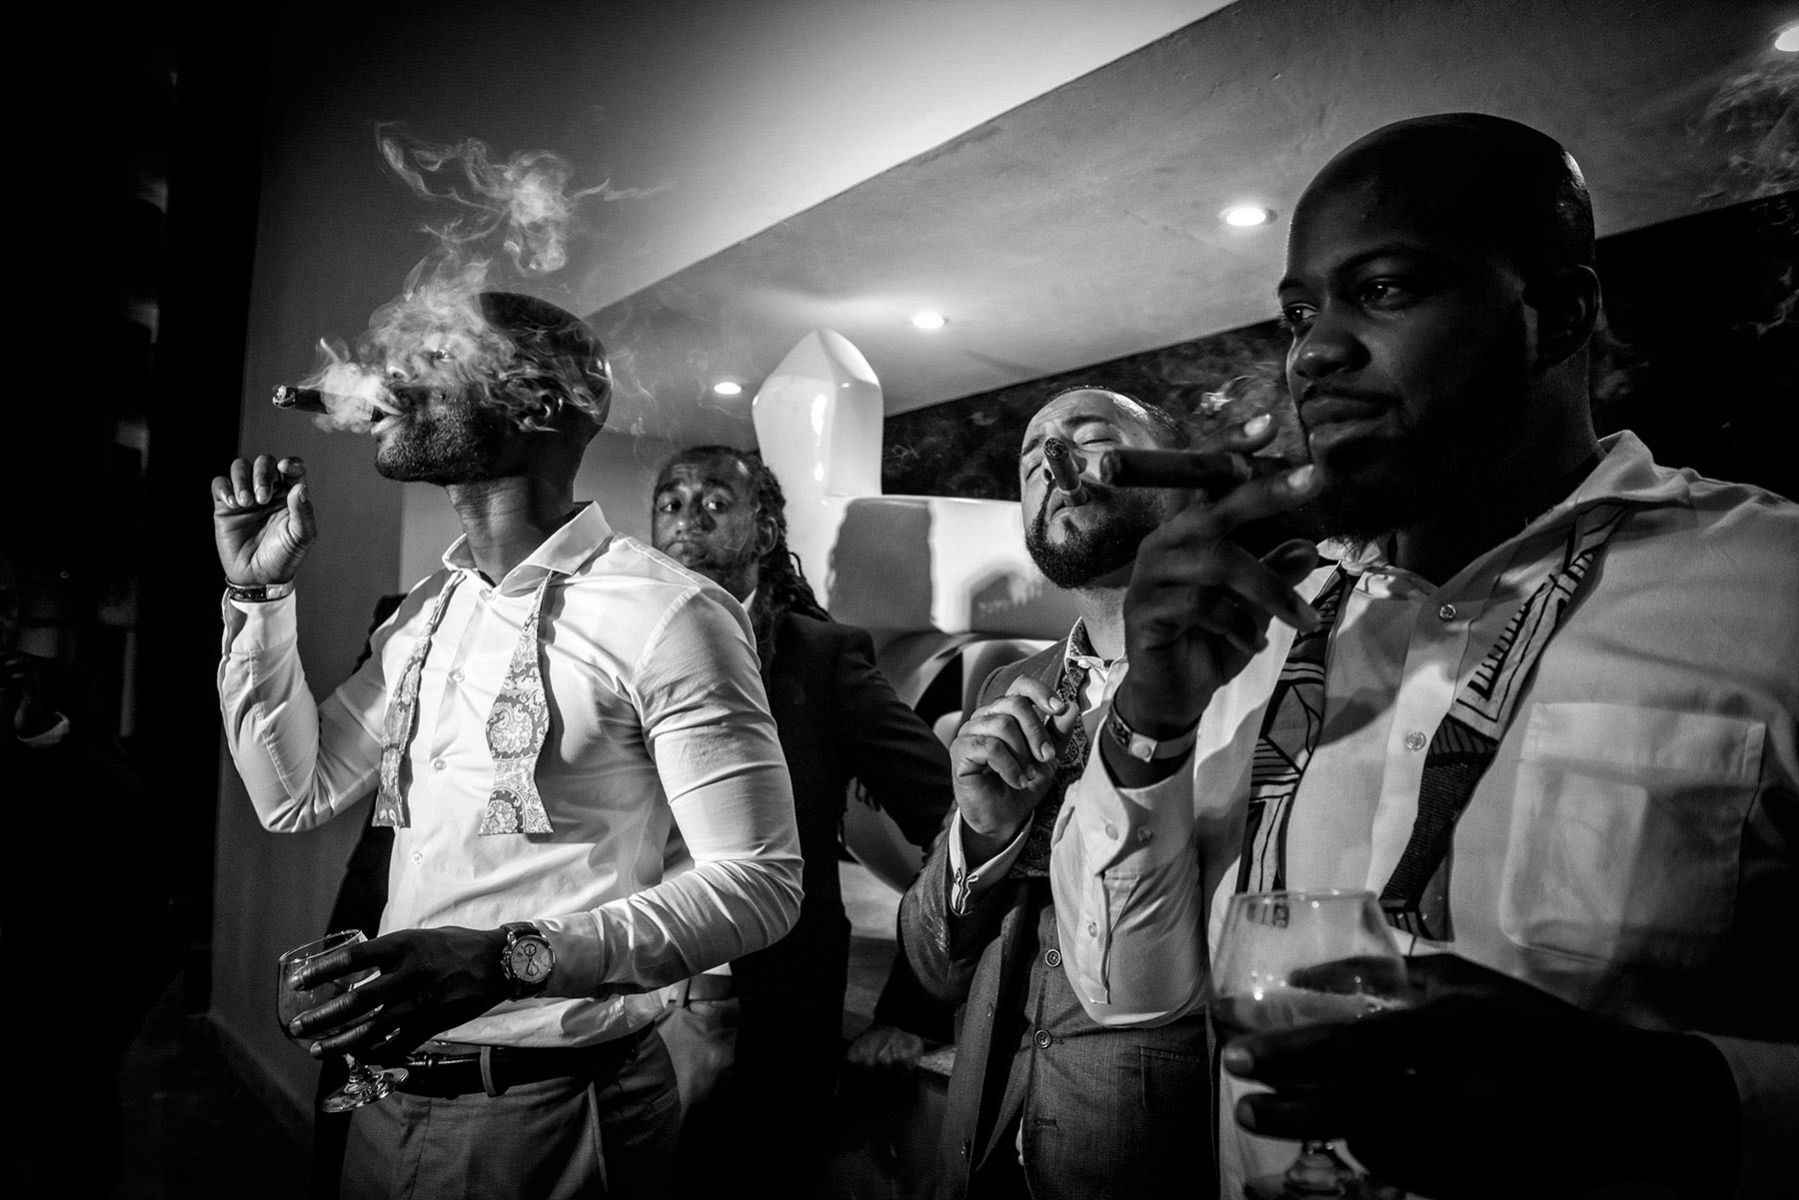 Montreal wedding photographer, bridal party portrait